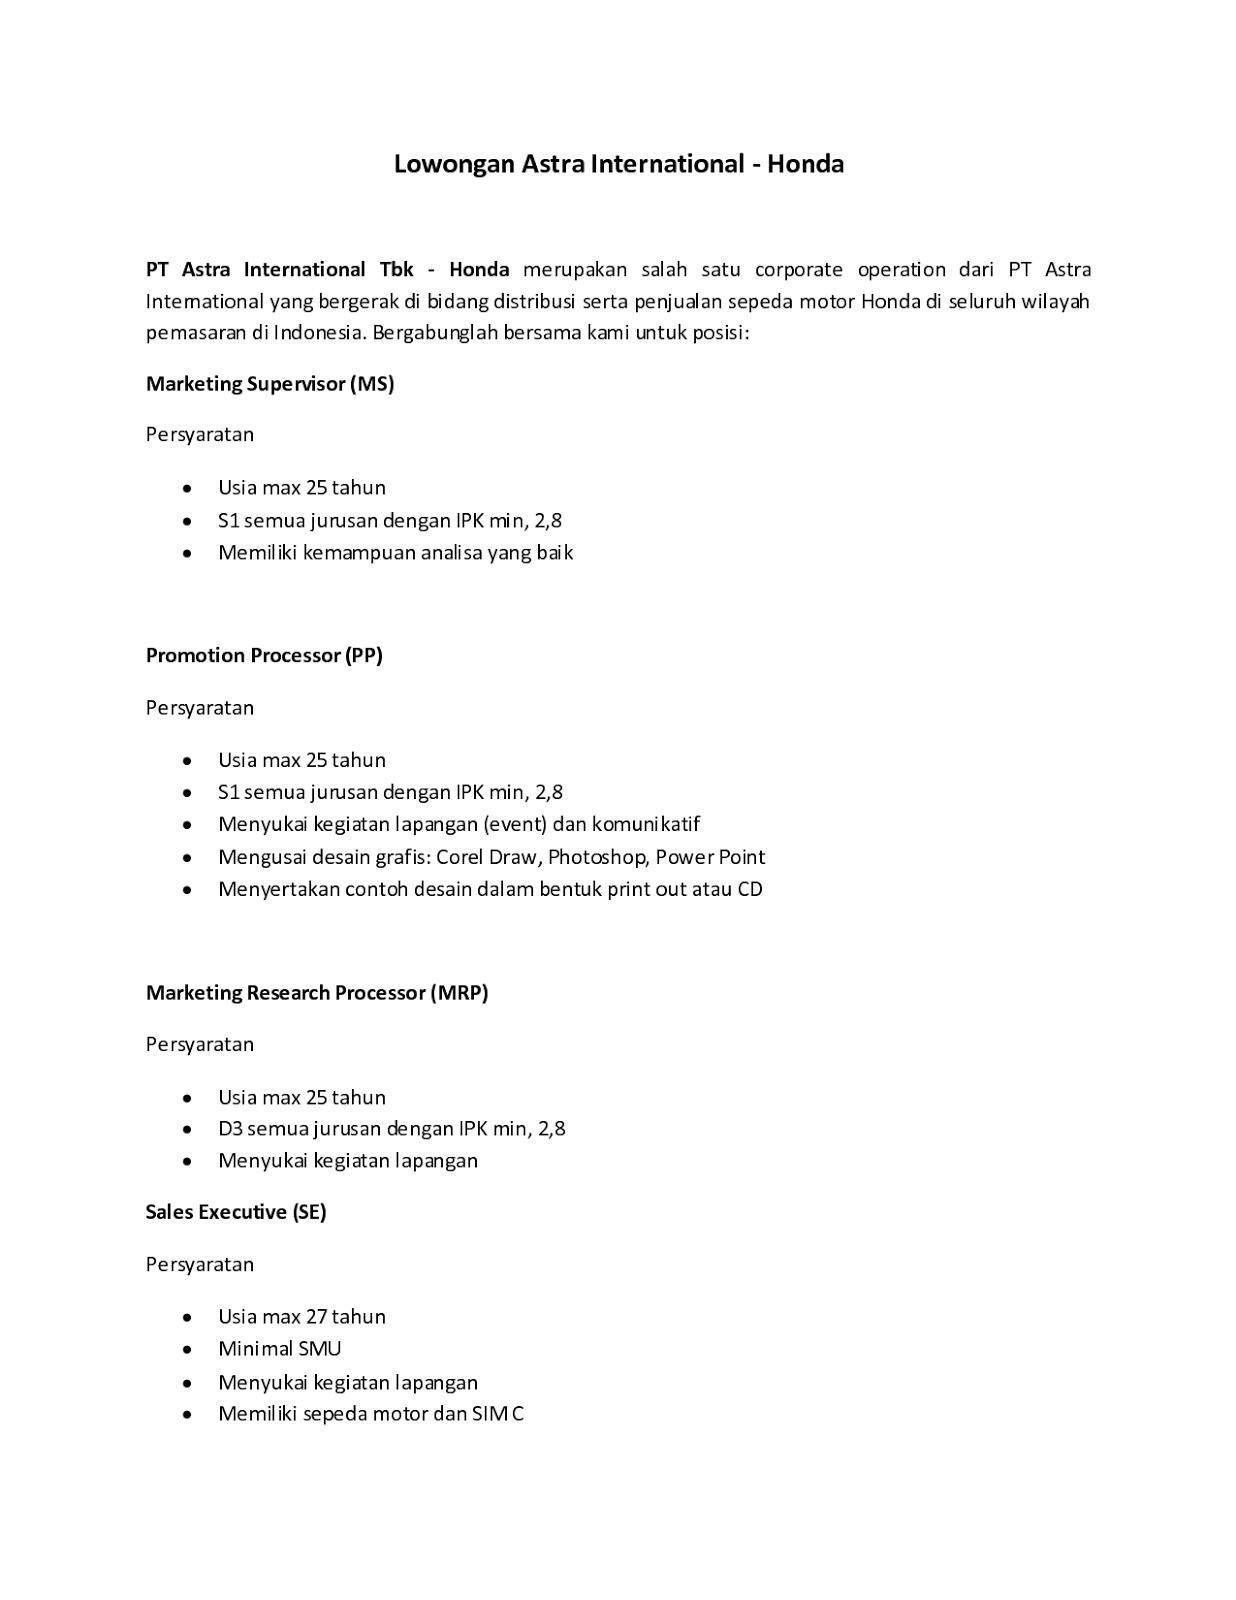 5 contoh surat lamaran kerja pt astra   ben jobs